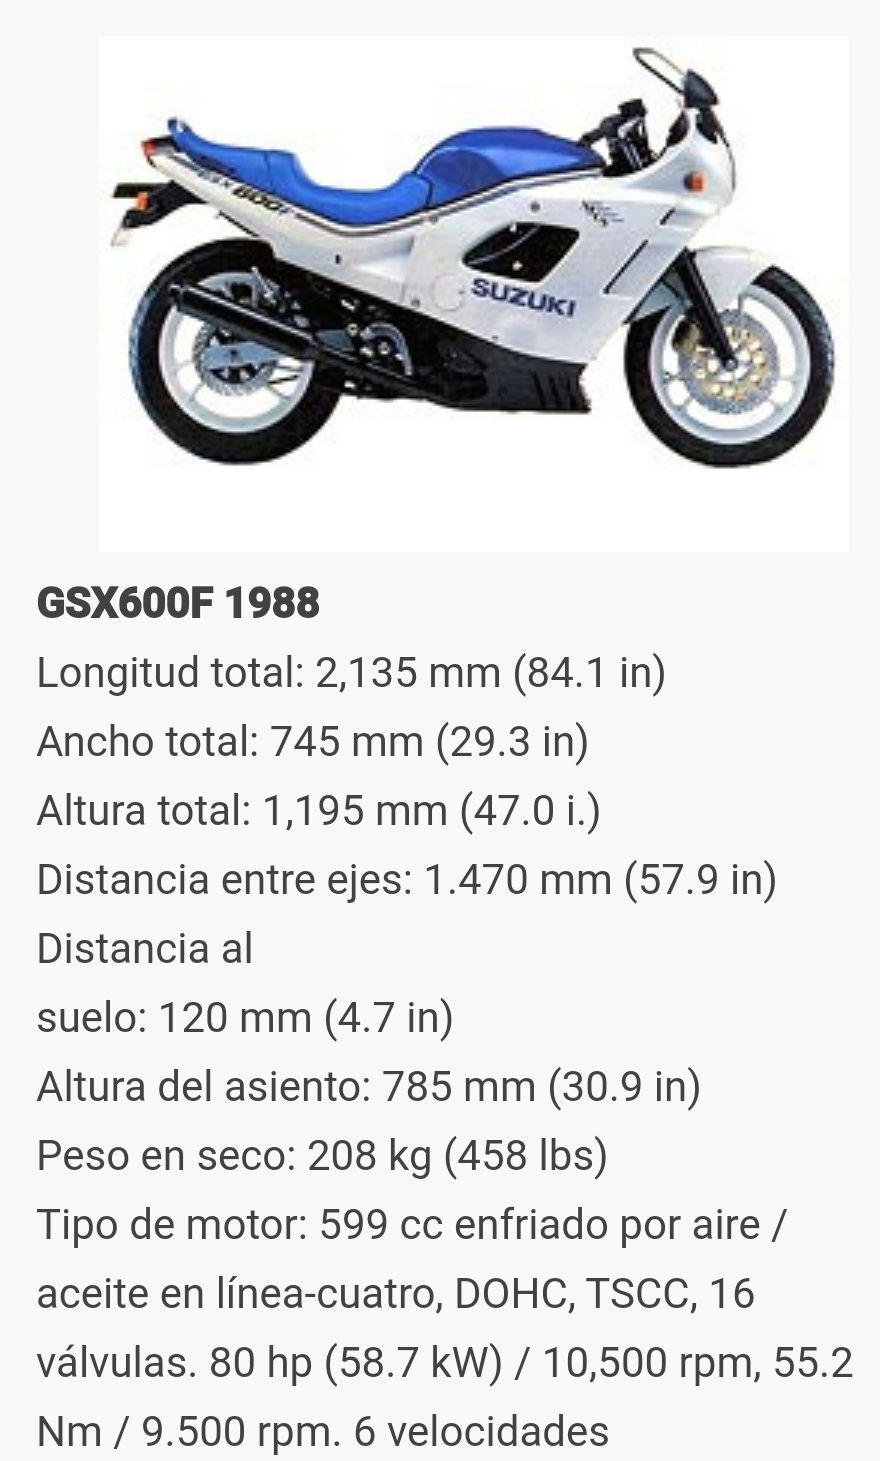 Horquilla de gsx600f Img_2024